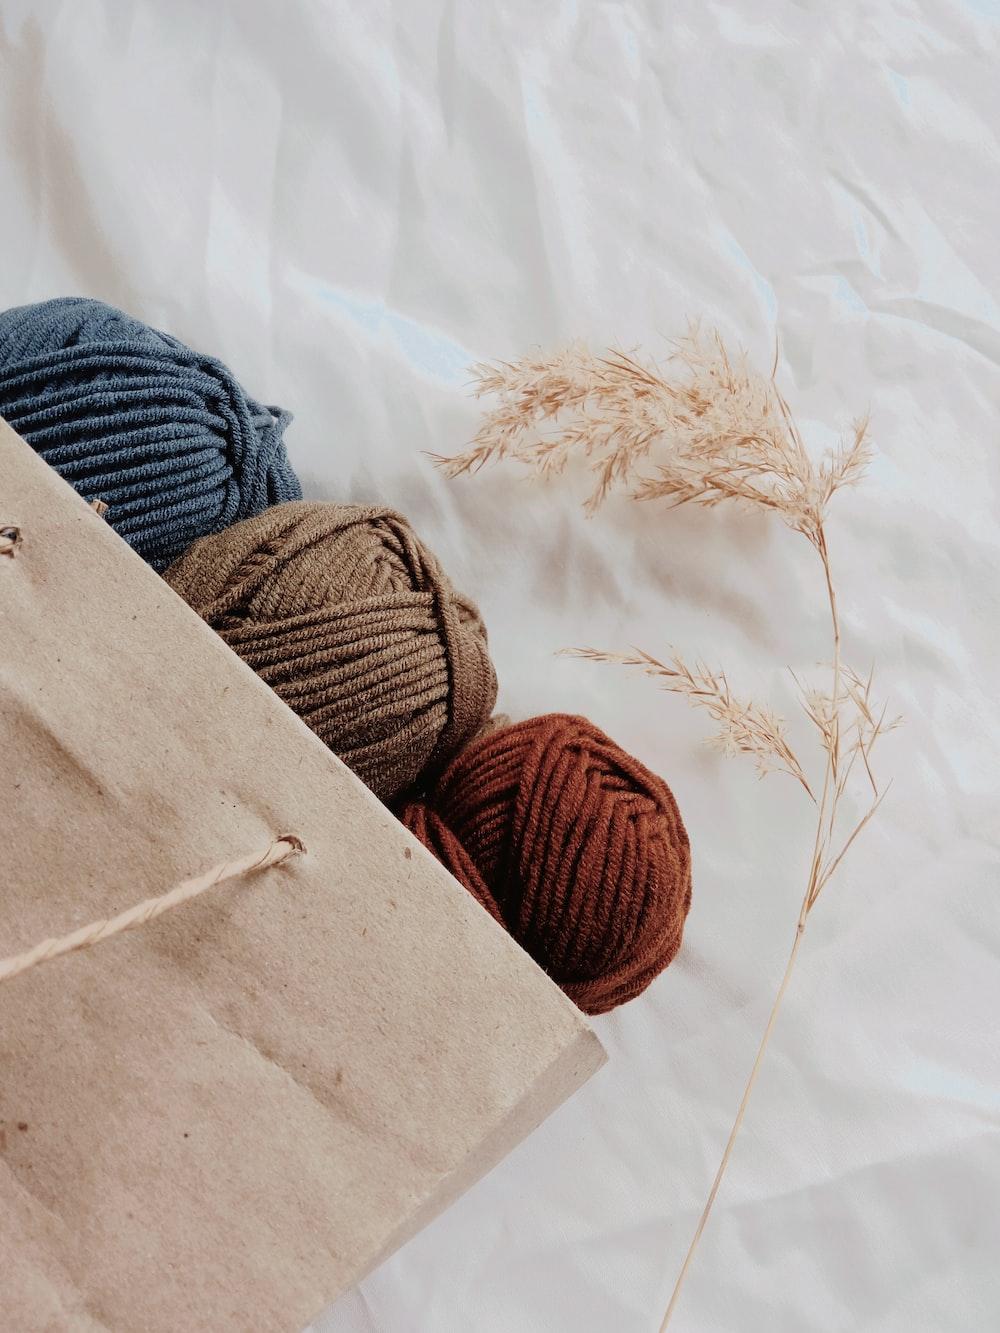 blue, brown, and orange yarn threads